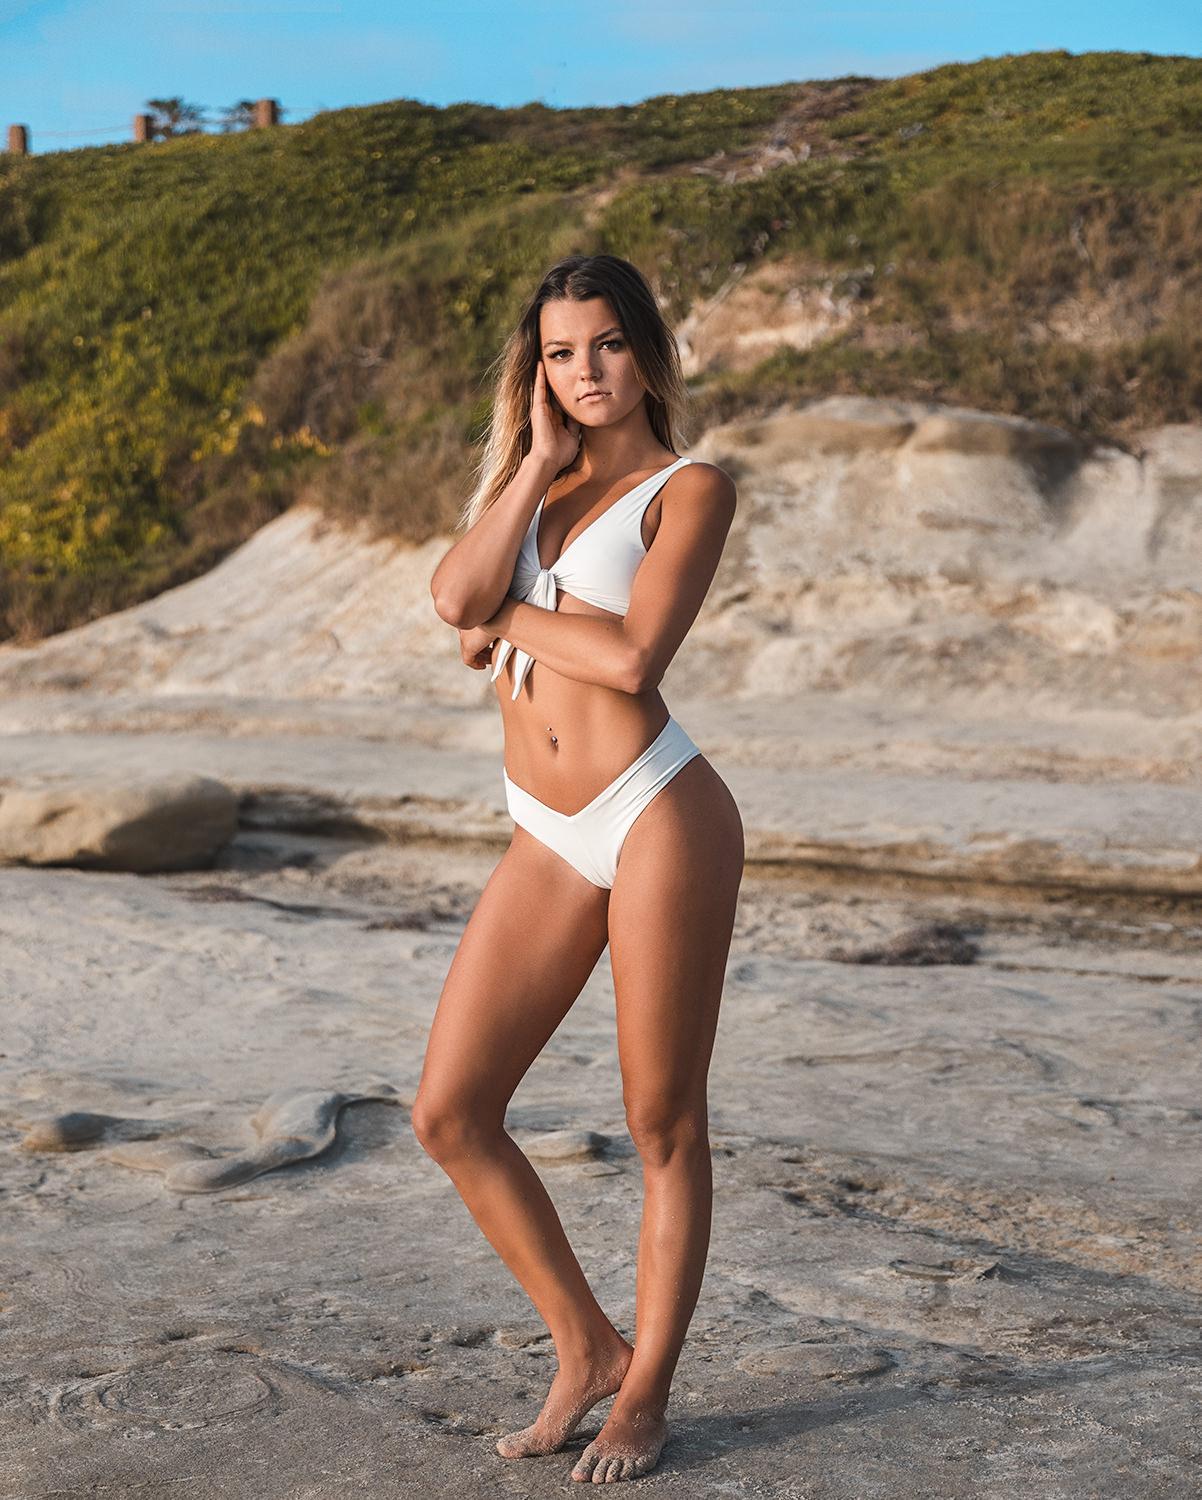 livroyalty bikini